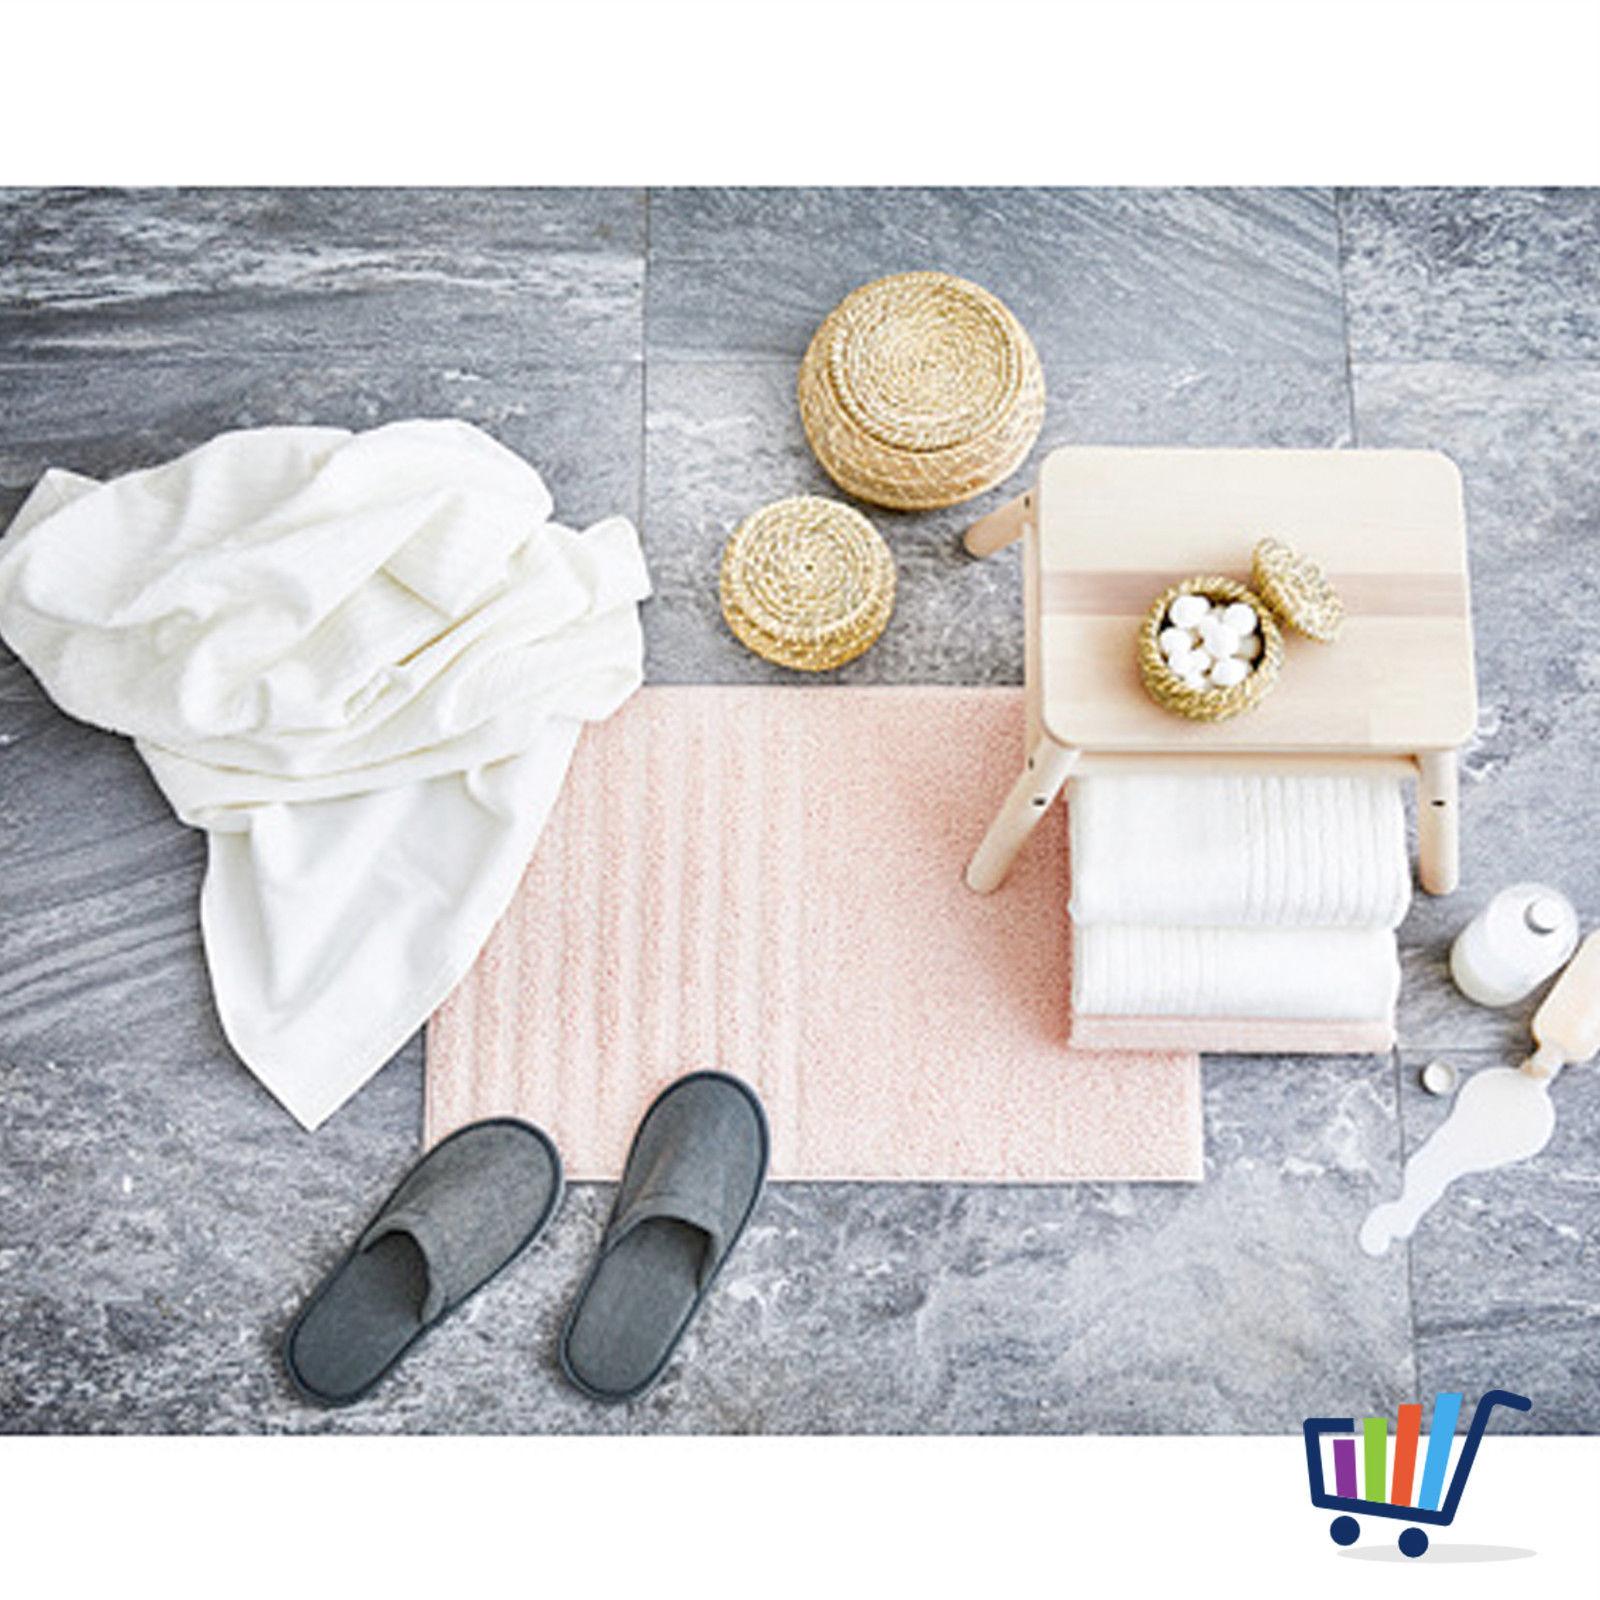 badezimmer matte cool die zone denmark flow x cm anthrazit with badezimmer matte simple. Black Bedroom Furniture Sets. Home Design Ideas